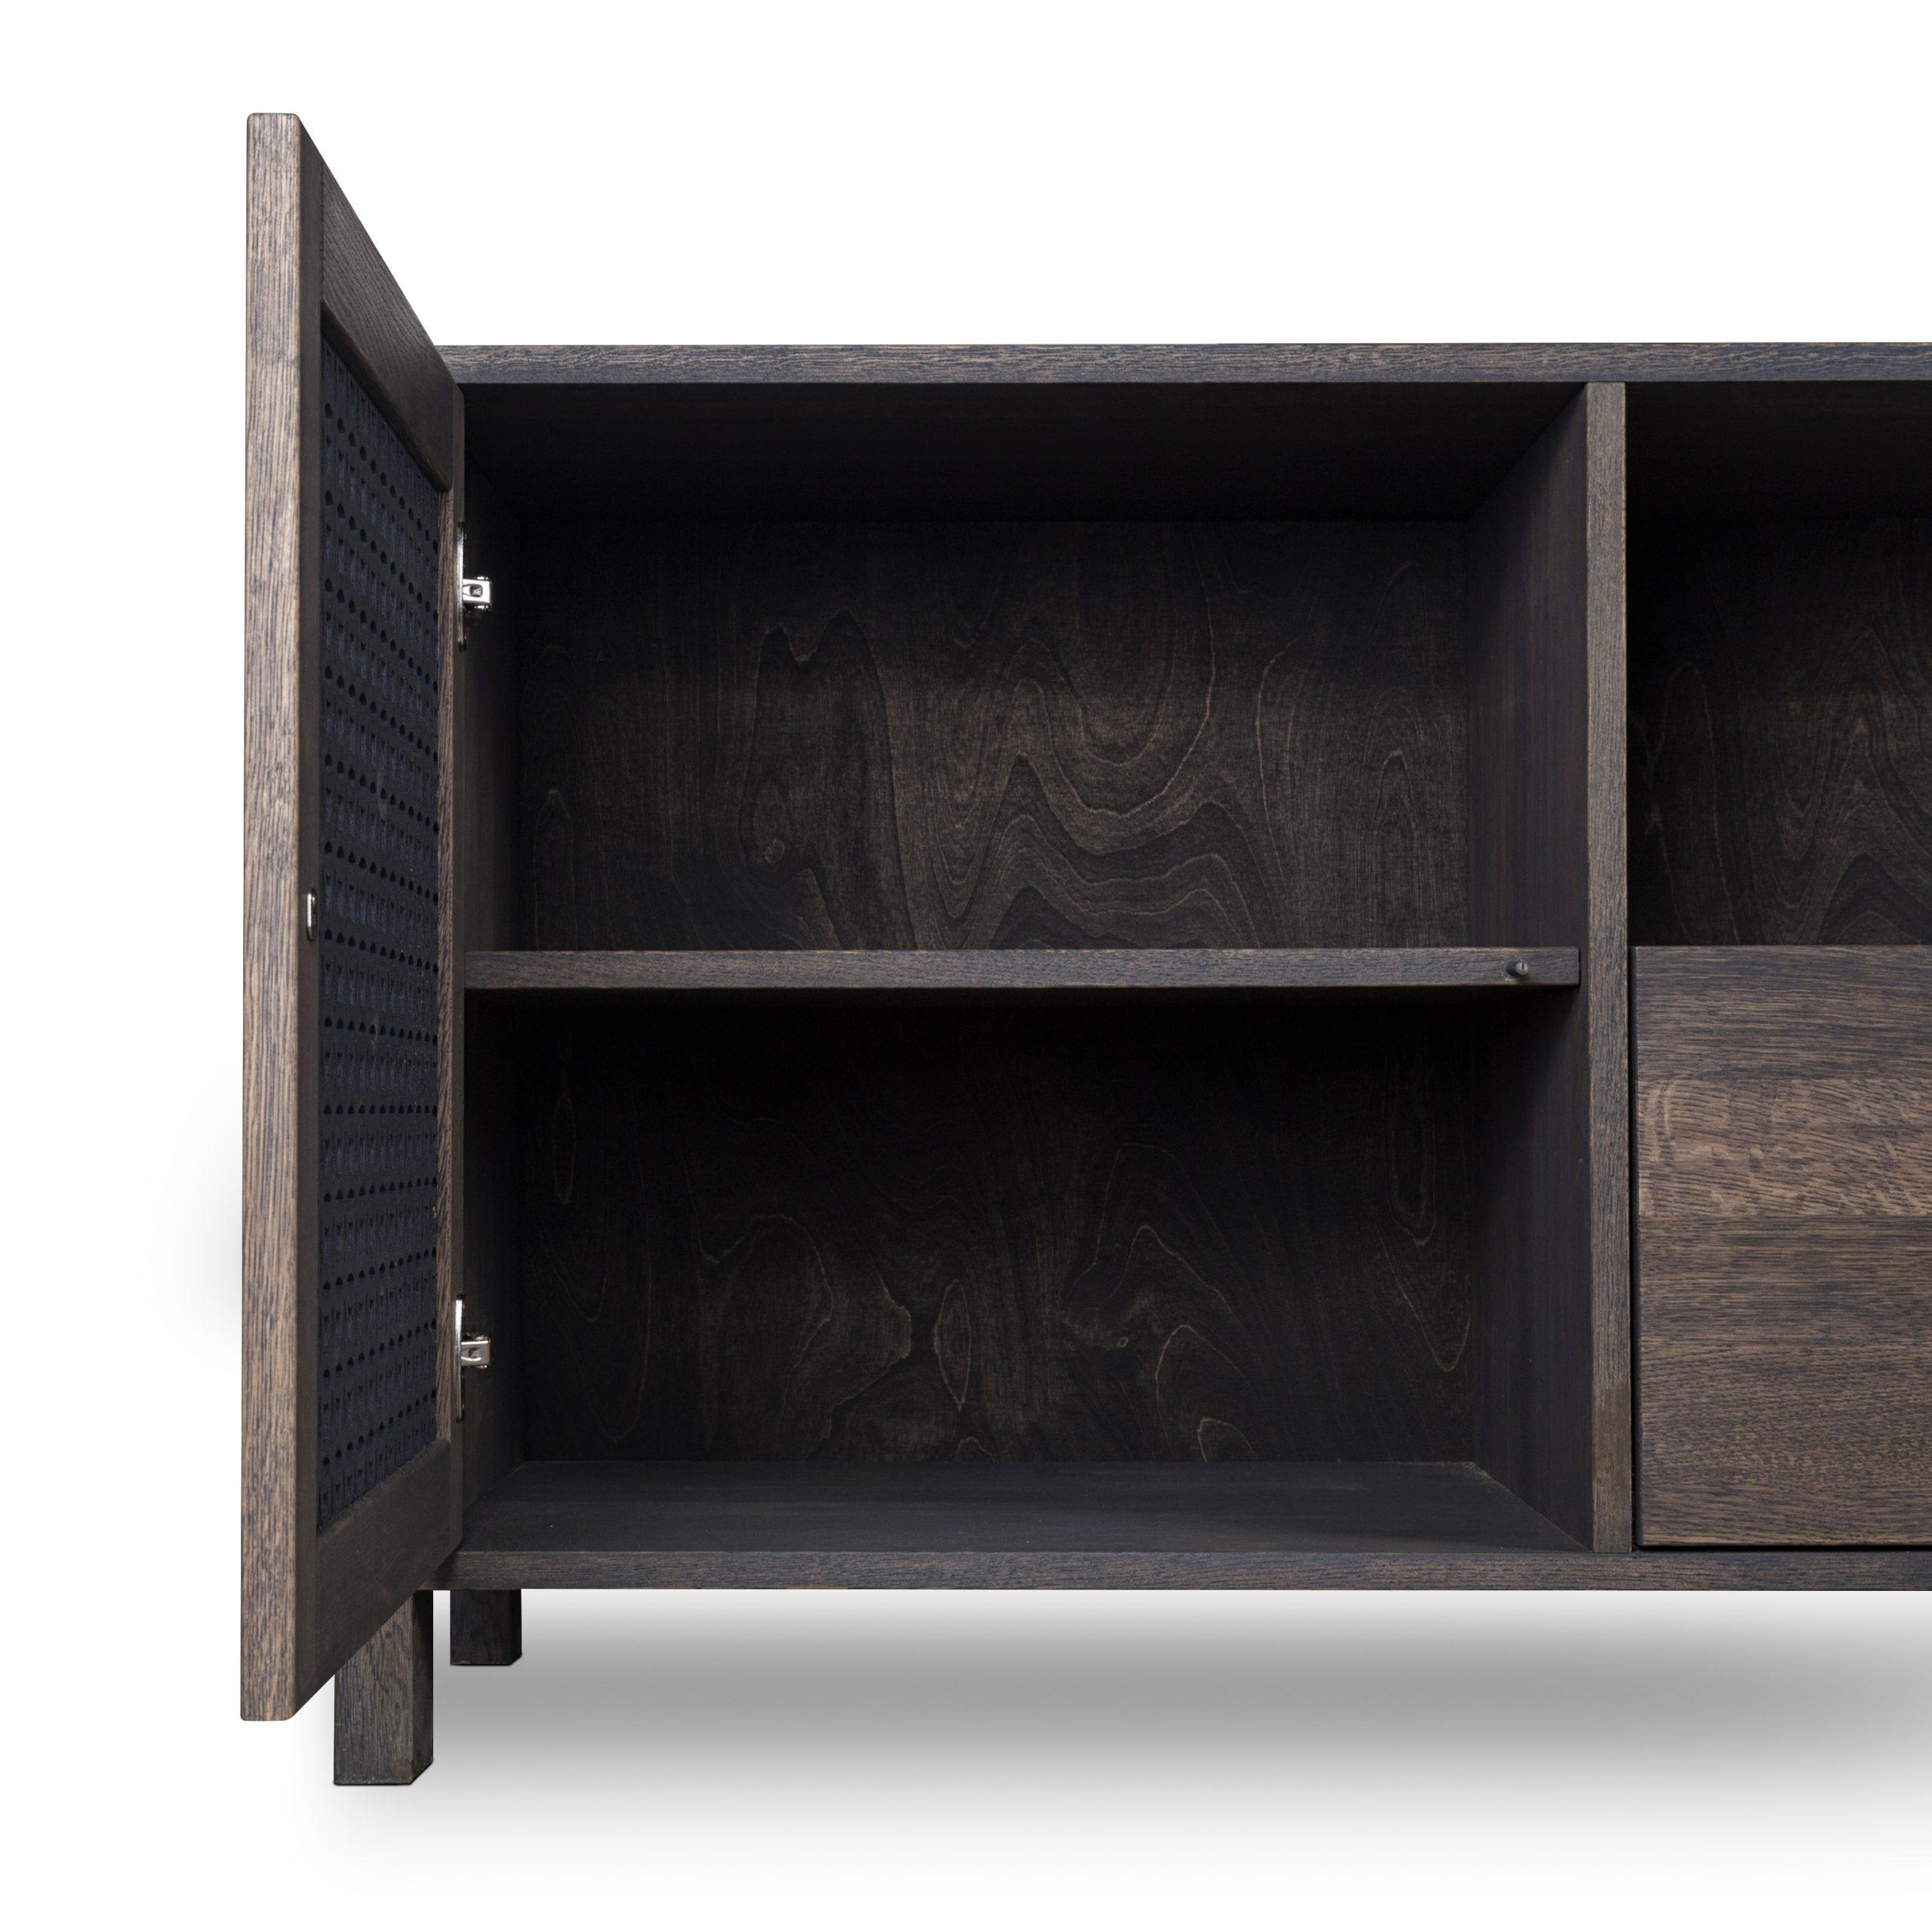 Juga-furniture-baldu-gamyba-vilniuje-tv-spintele-TOMI-produktas-4